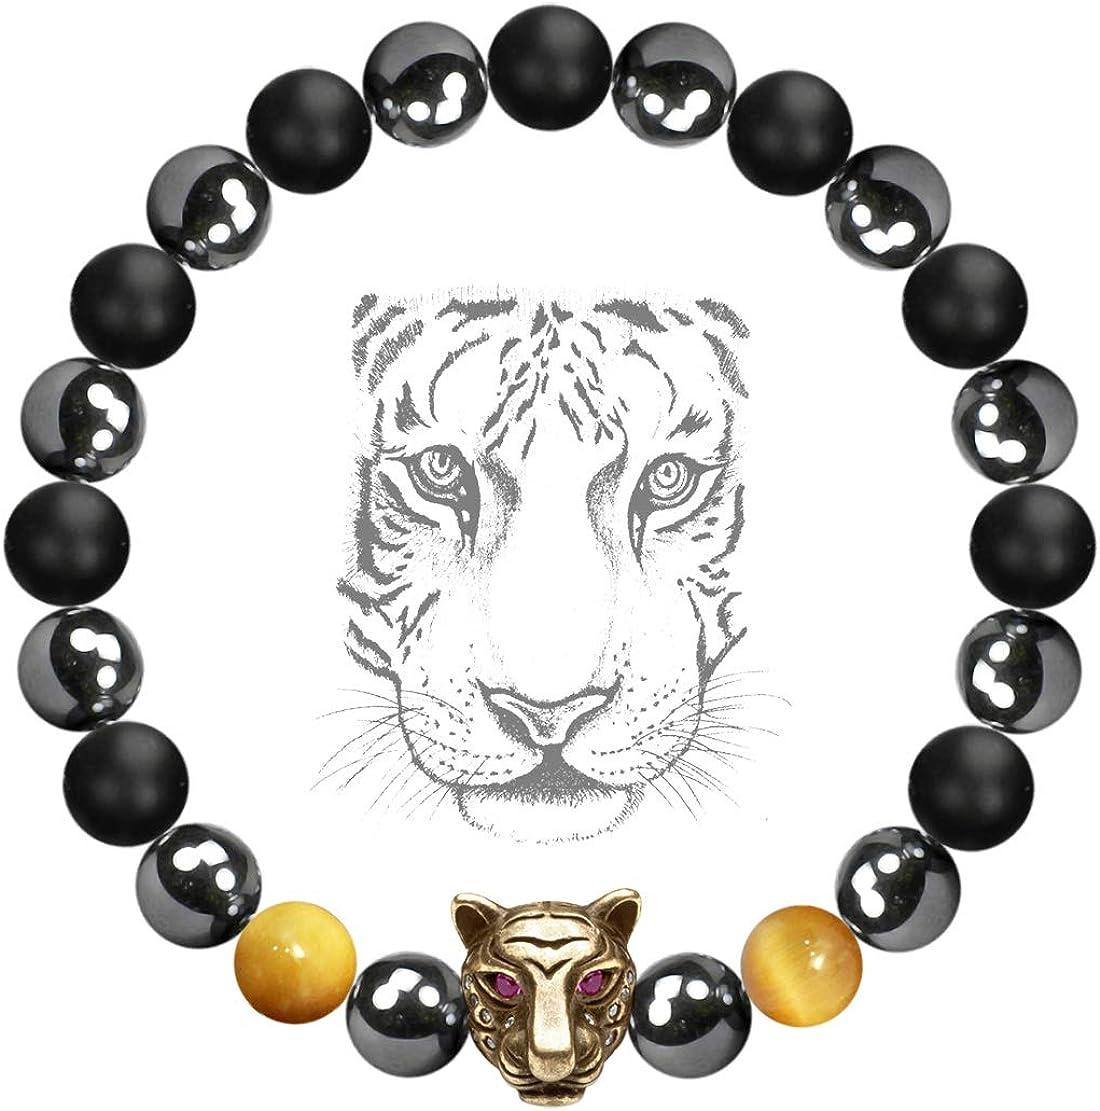 Natural Healing Stone Bracelet-Blue Topaz Bracelet-Meditation Spiritual Protection Balance Calming Grounding Anxiety Relief Bracelet  Gift